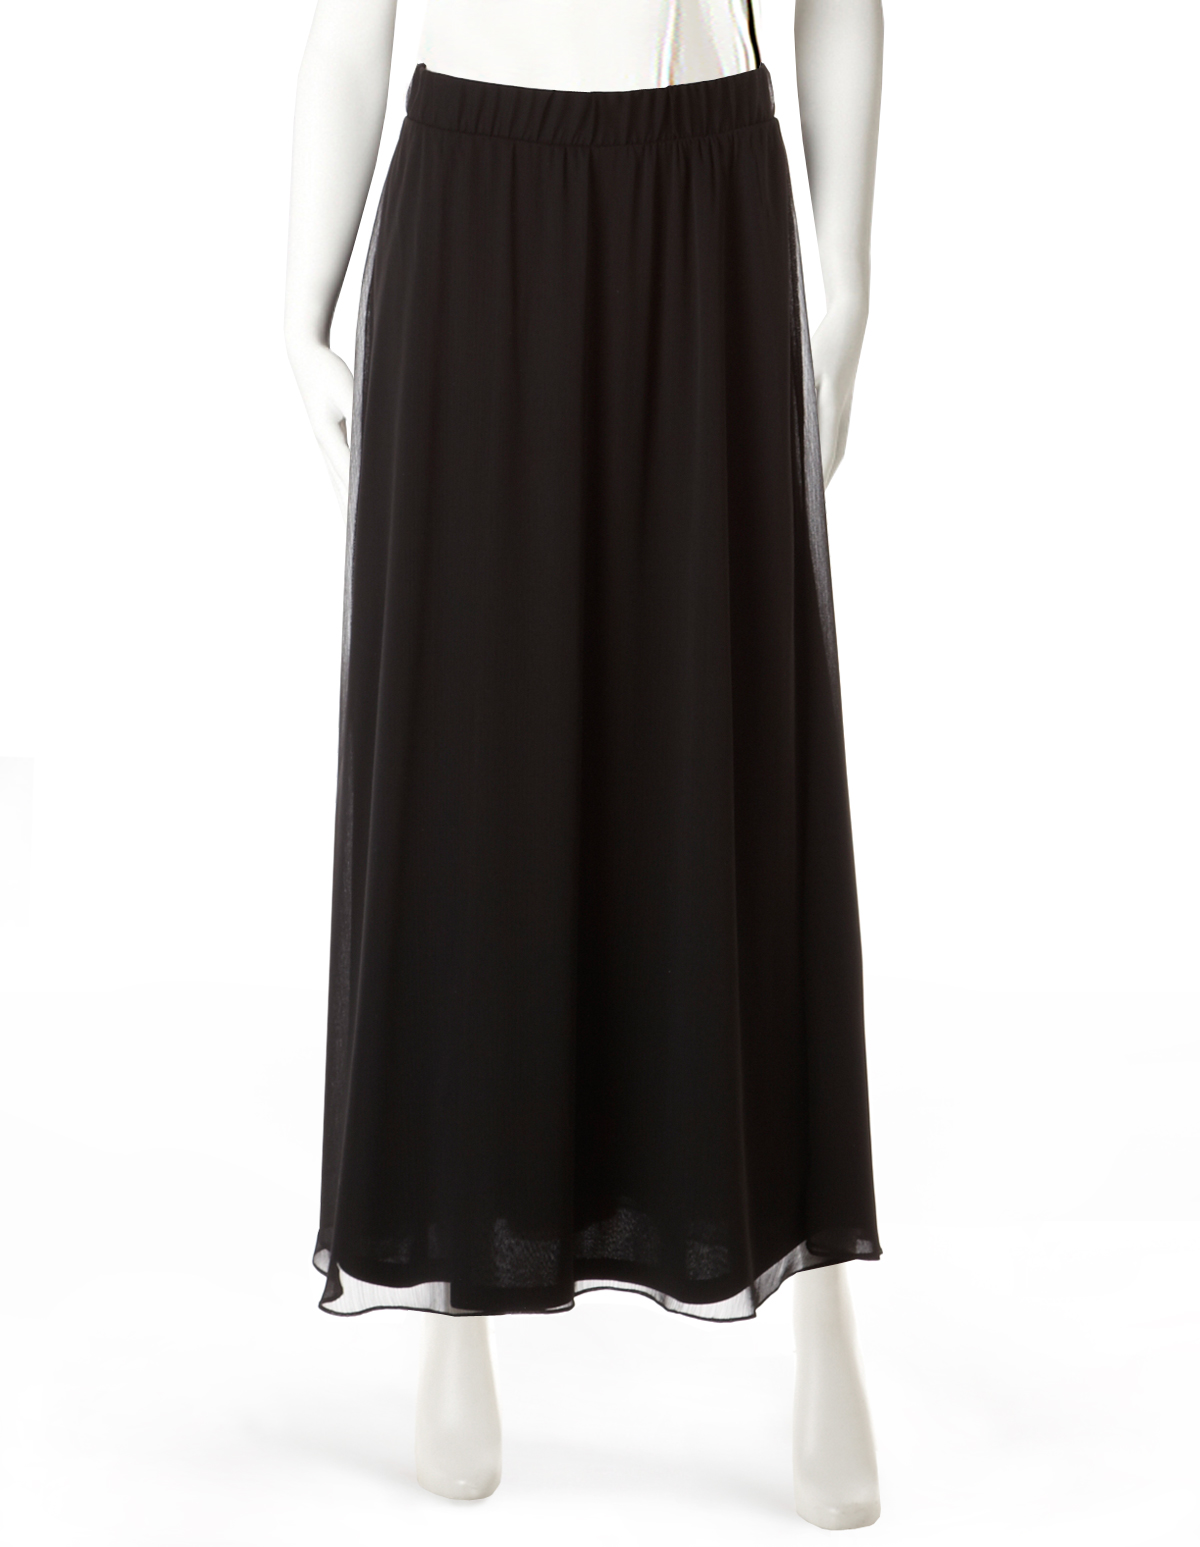 4e0aa547f3 Black Chiffon Maxi Skirt, Black, hi-res